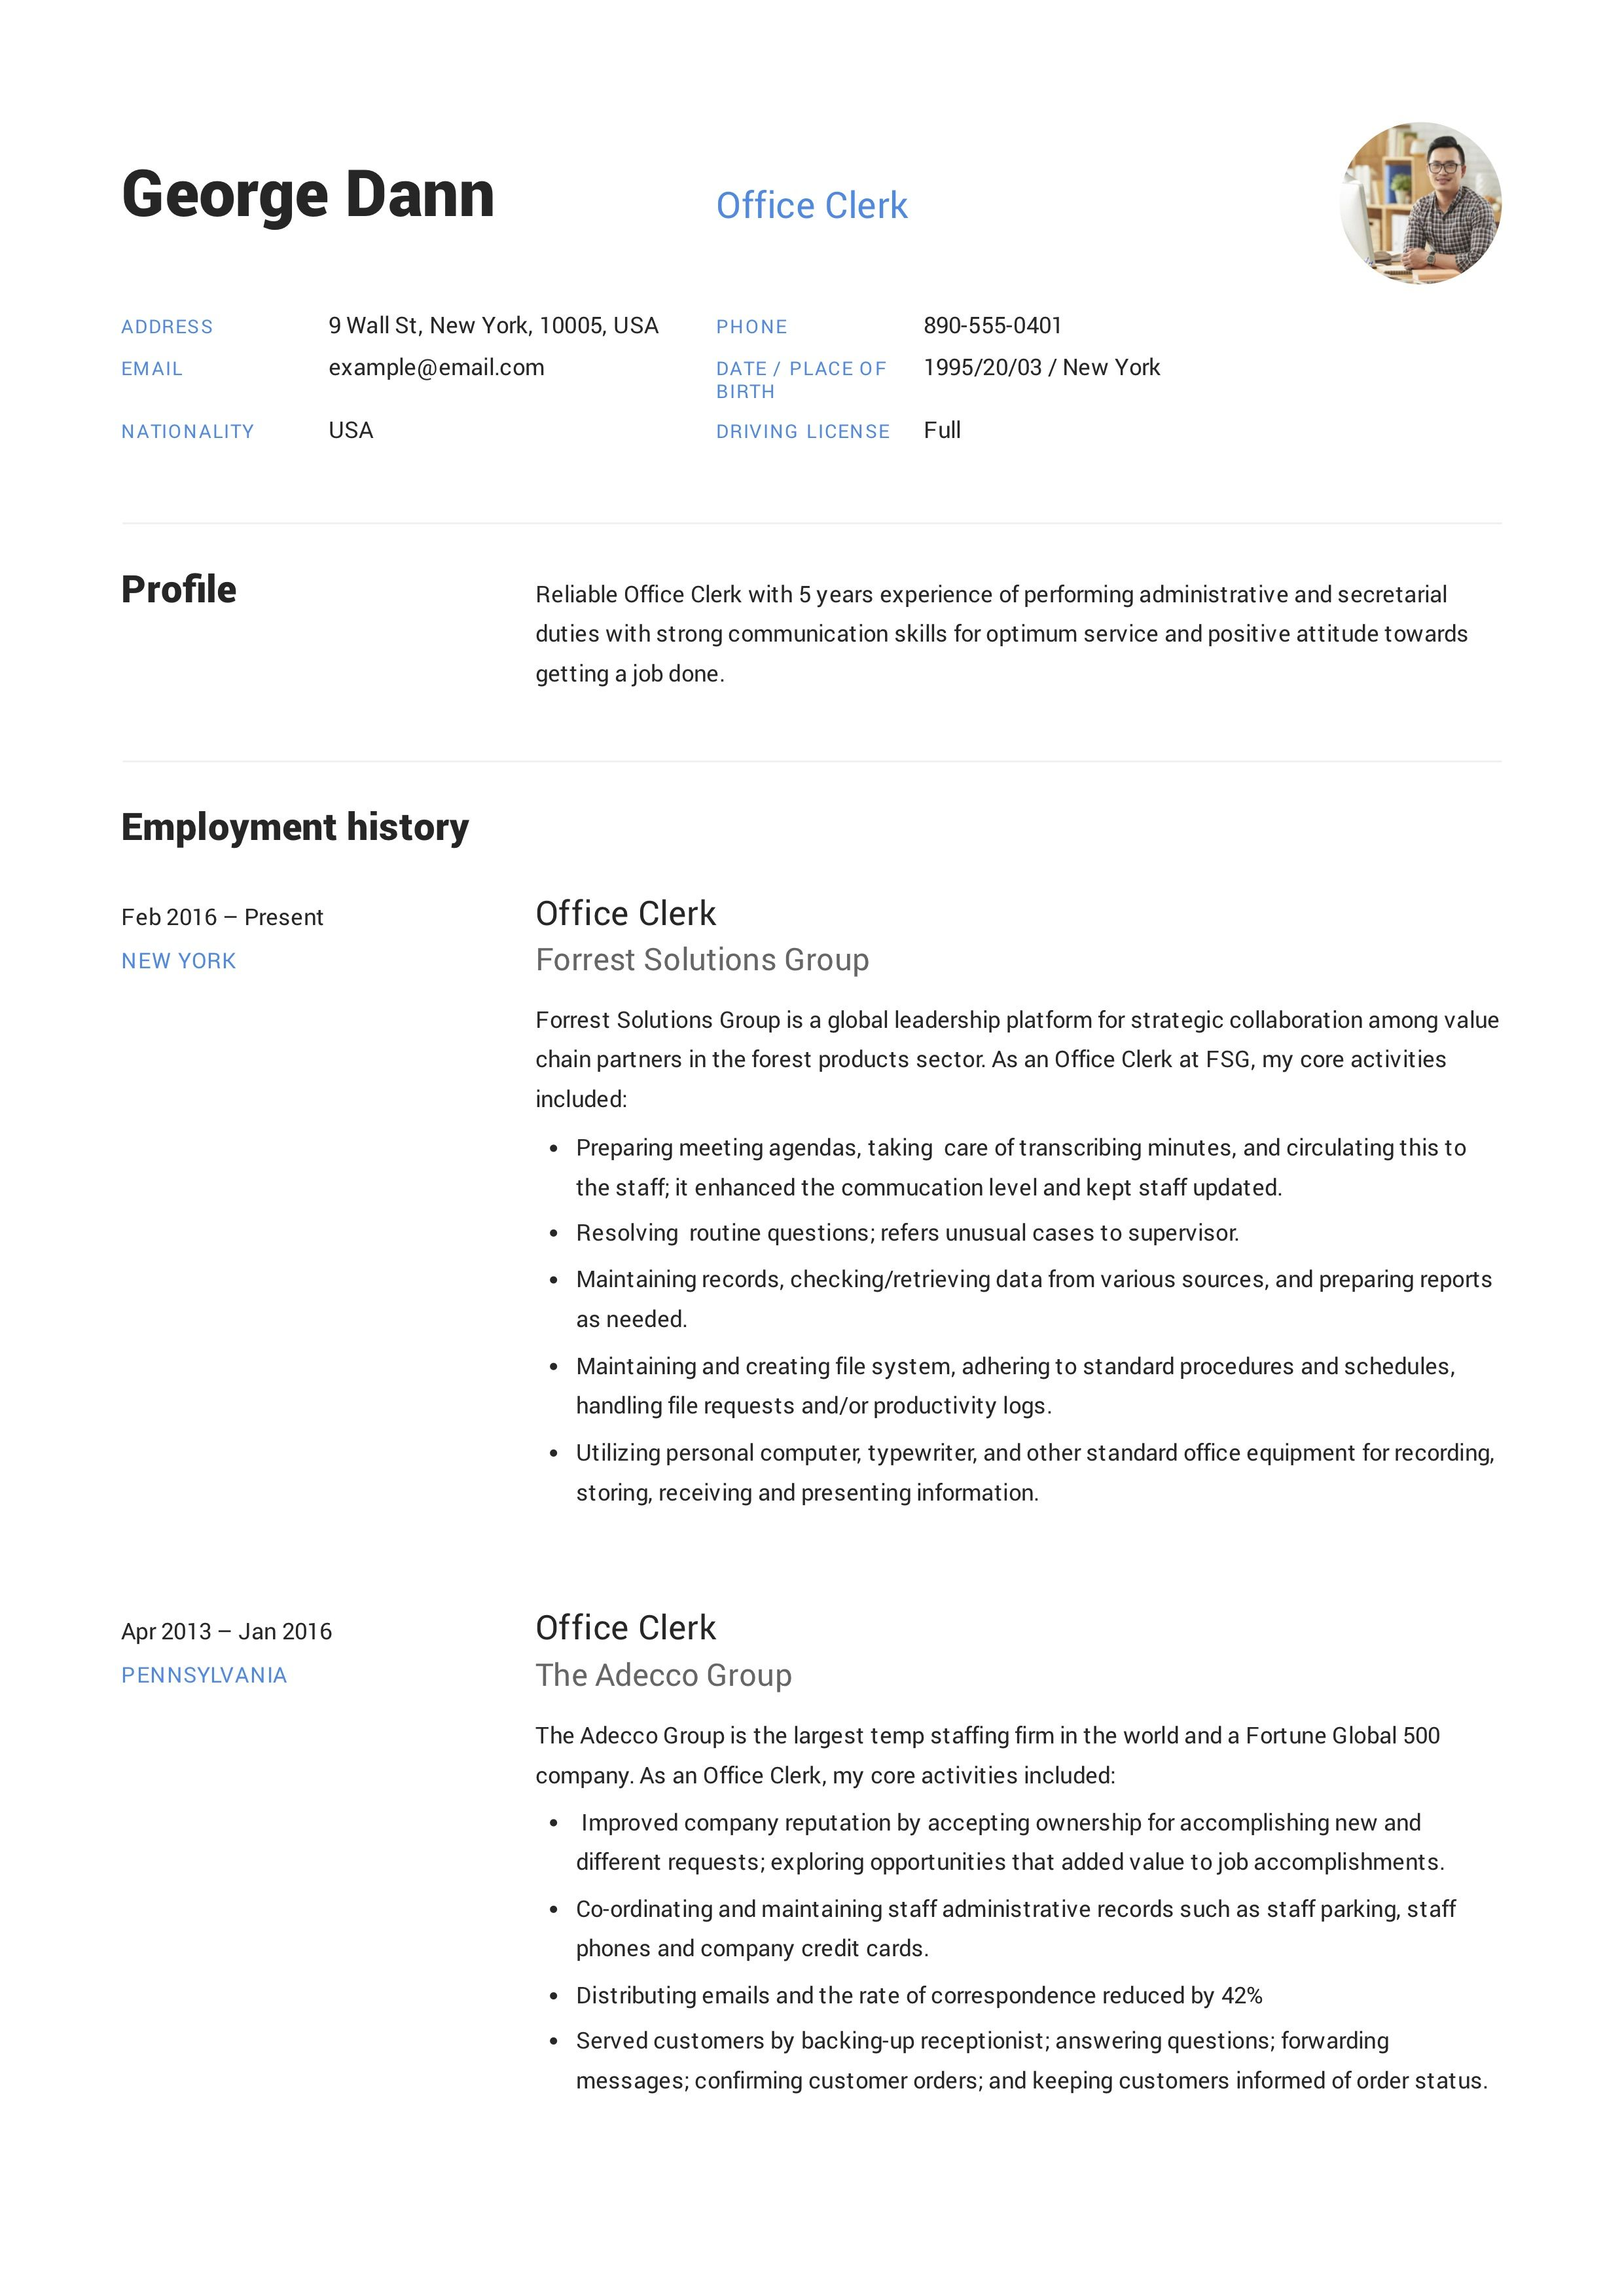 Office Clerk Resume Job Resume Examples Resume Guide Job Resume